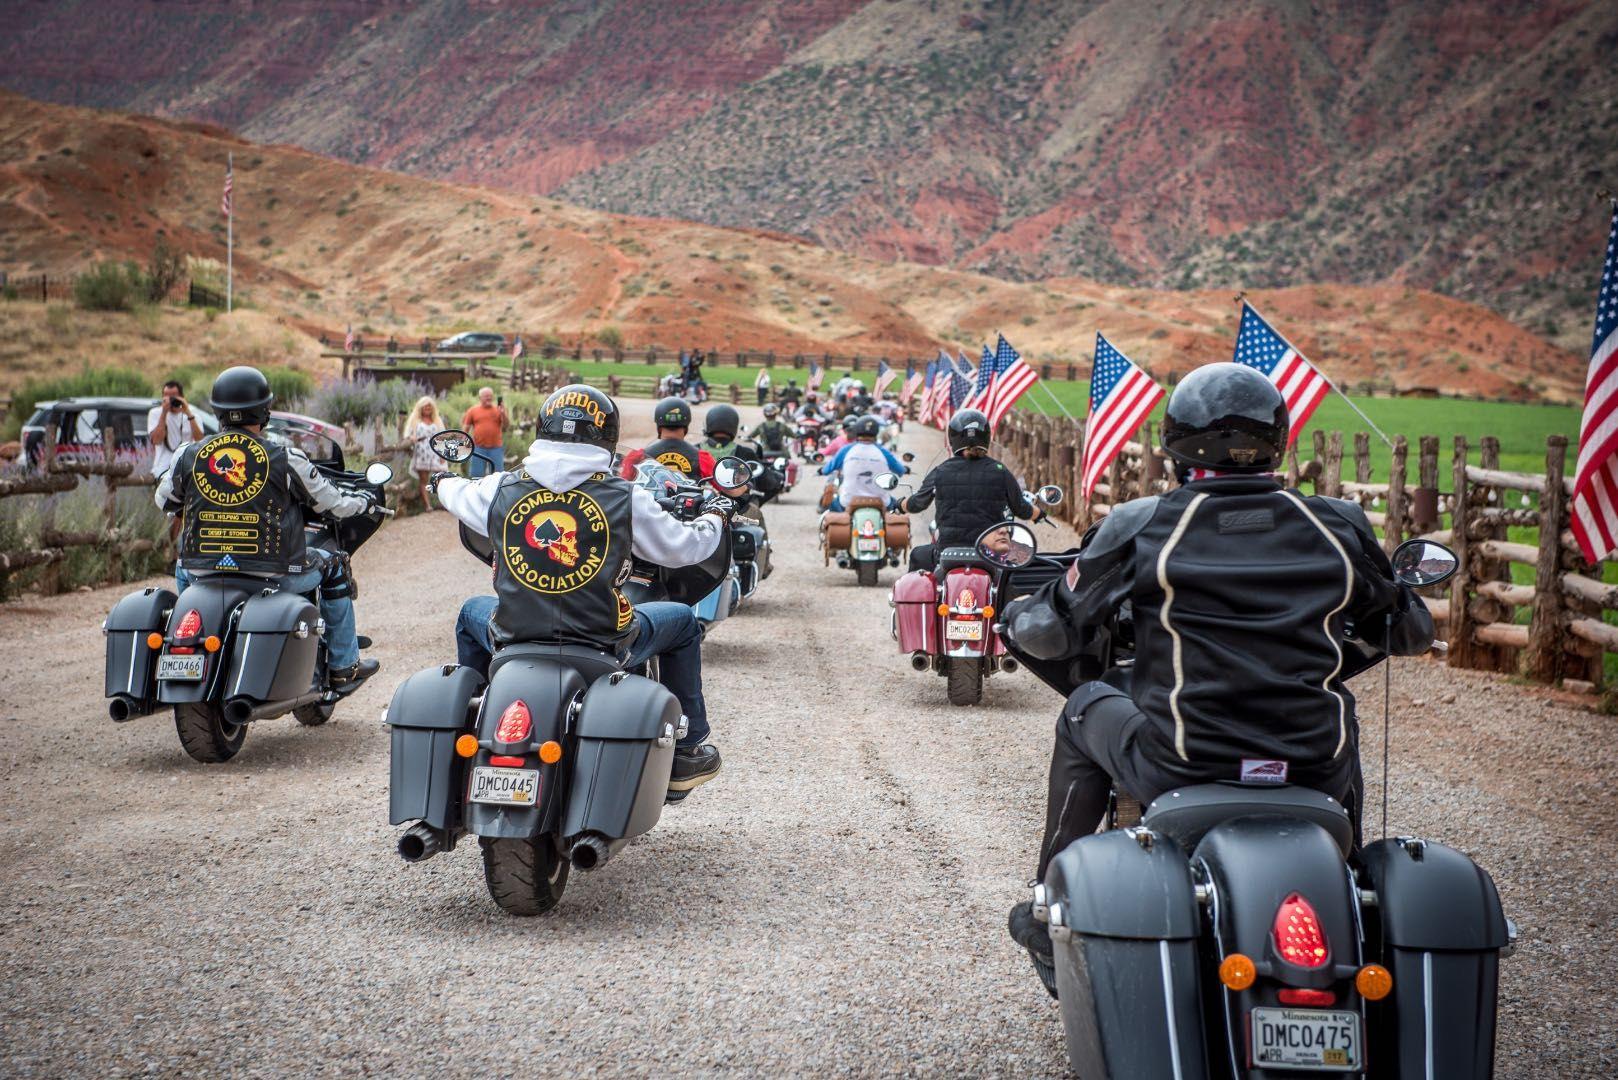 Sturgis Bike Rally 2018 Upcoming Events